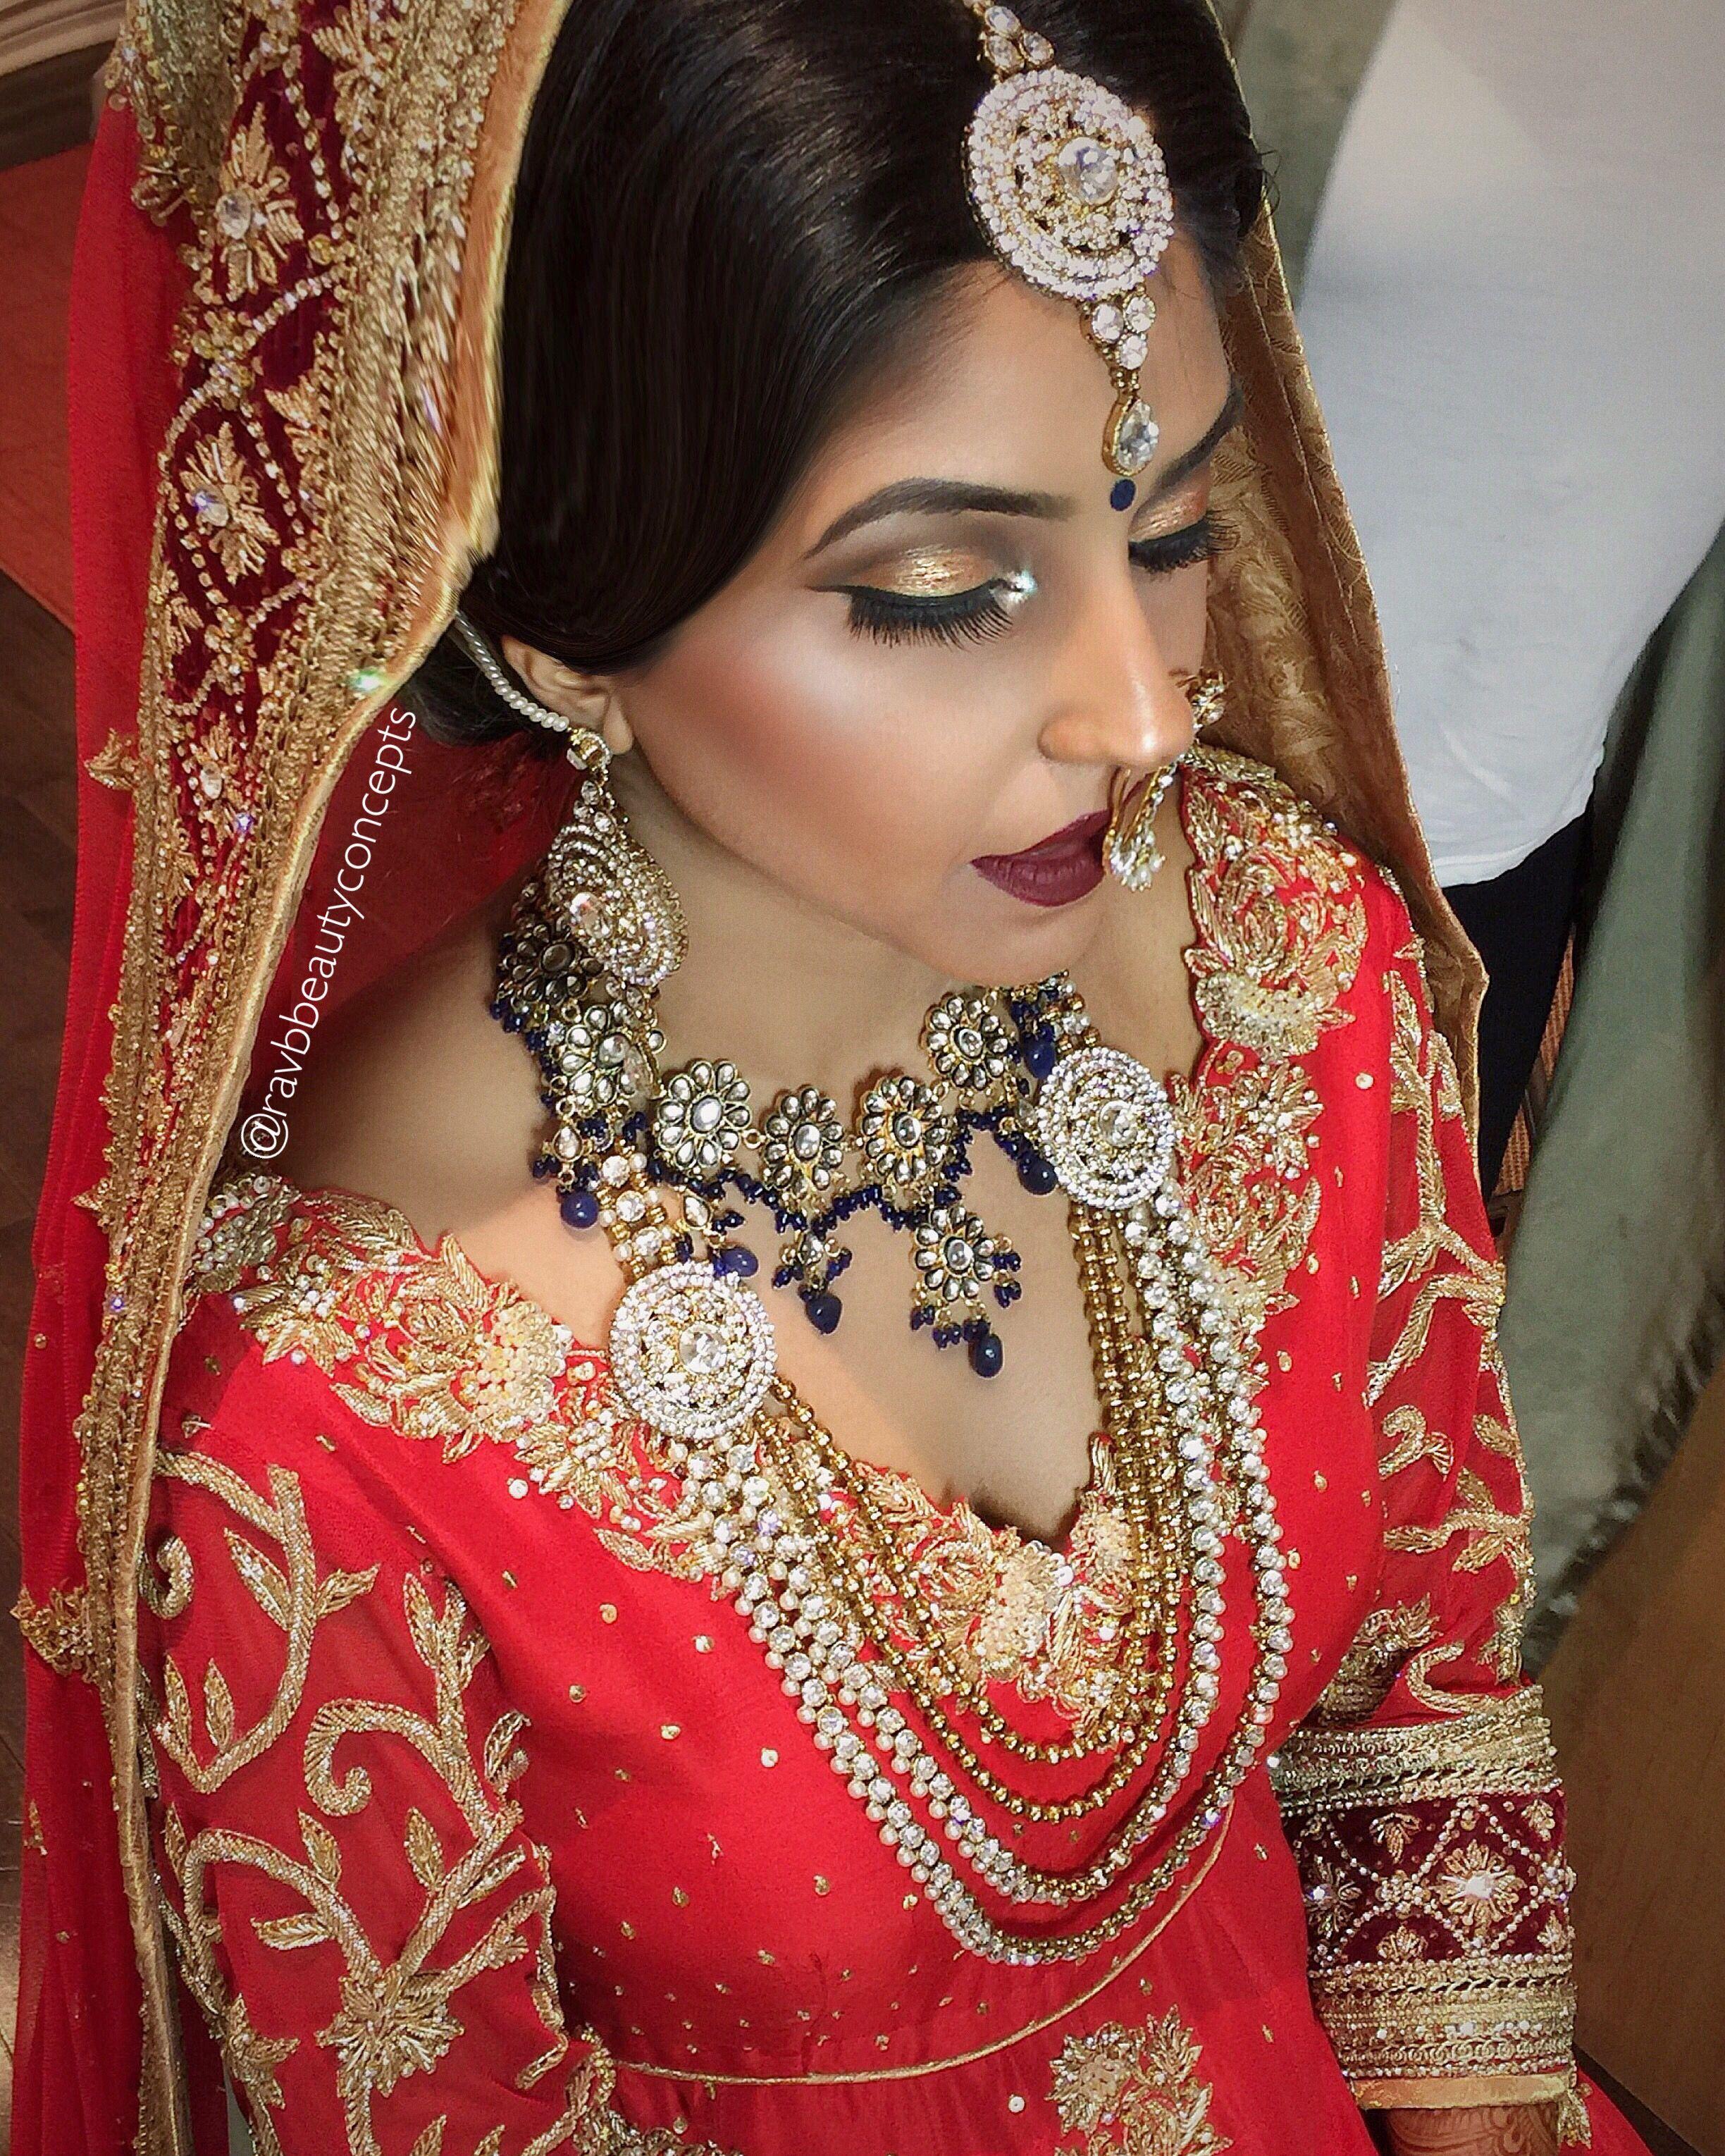 Indian Bridal Makeup Indian Bridal Hair Bridal Makeup Bridal Hair Punjabi Bride Punjabi Wedding Vog Best Bridal Makeup Bridal Makeup Artist Bridal Makeup